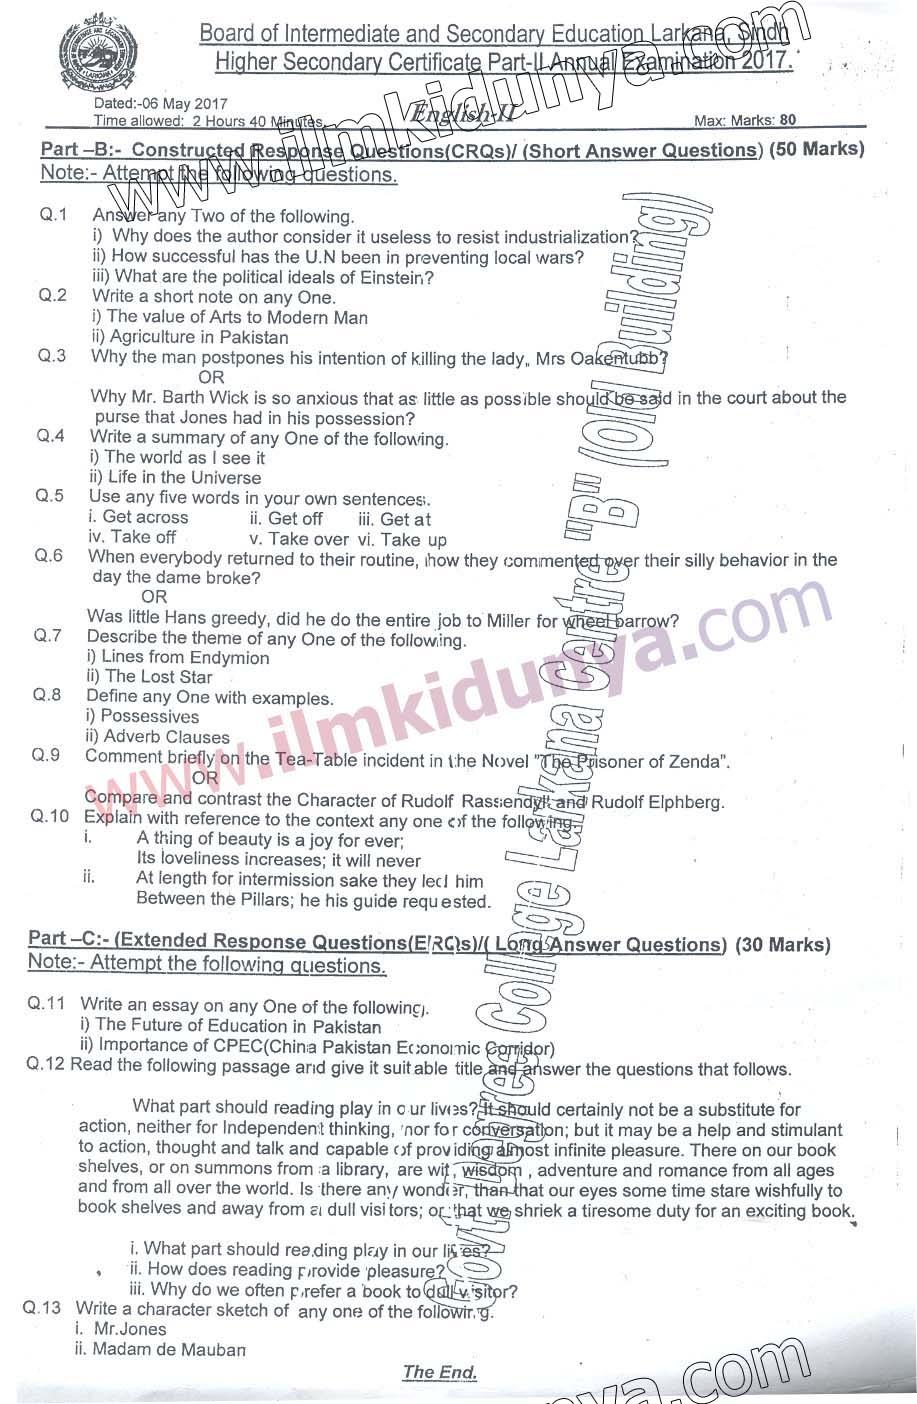 Past Papers 2017 Inter Part 2 Larkana Board English Subjective